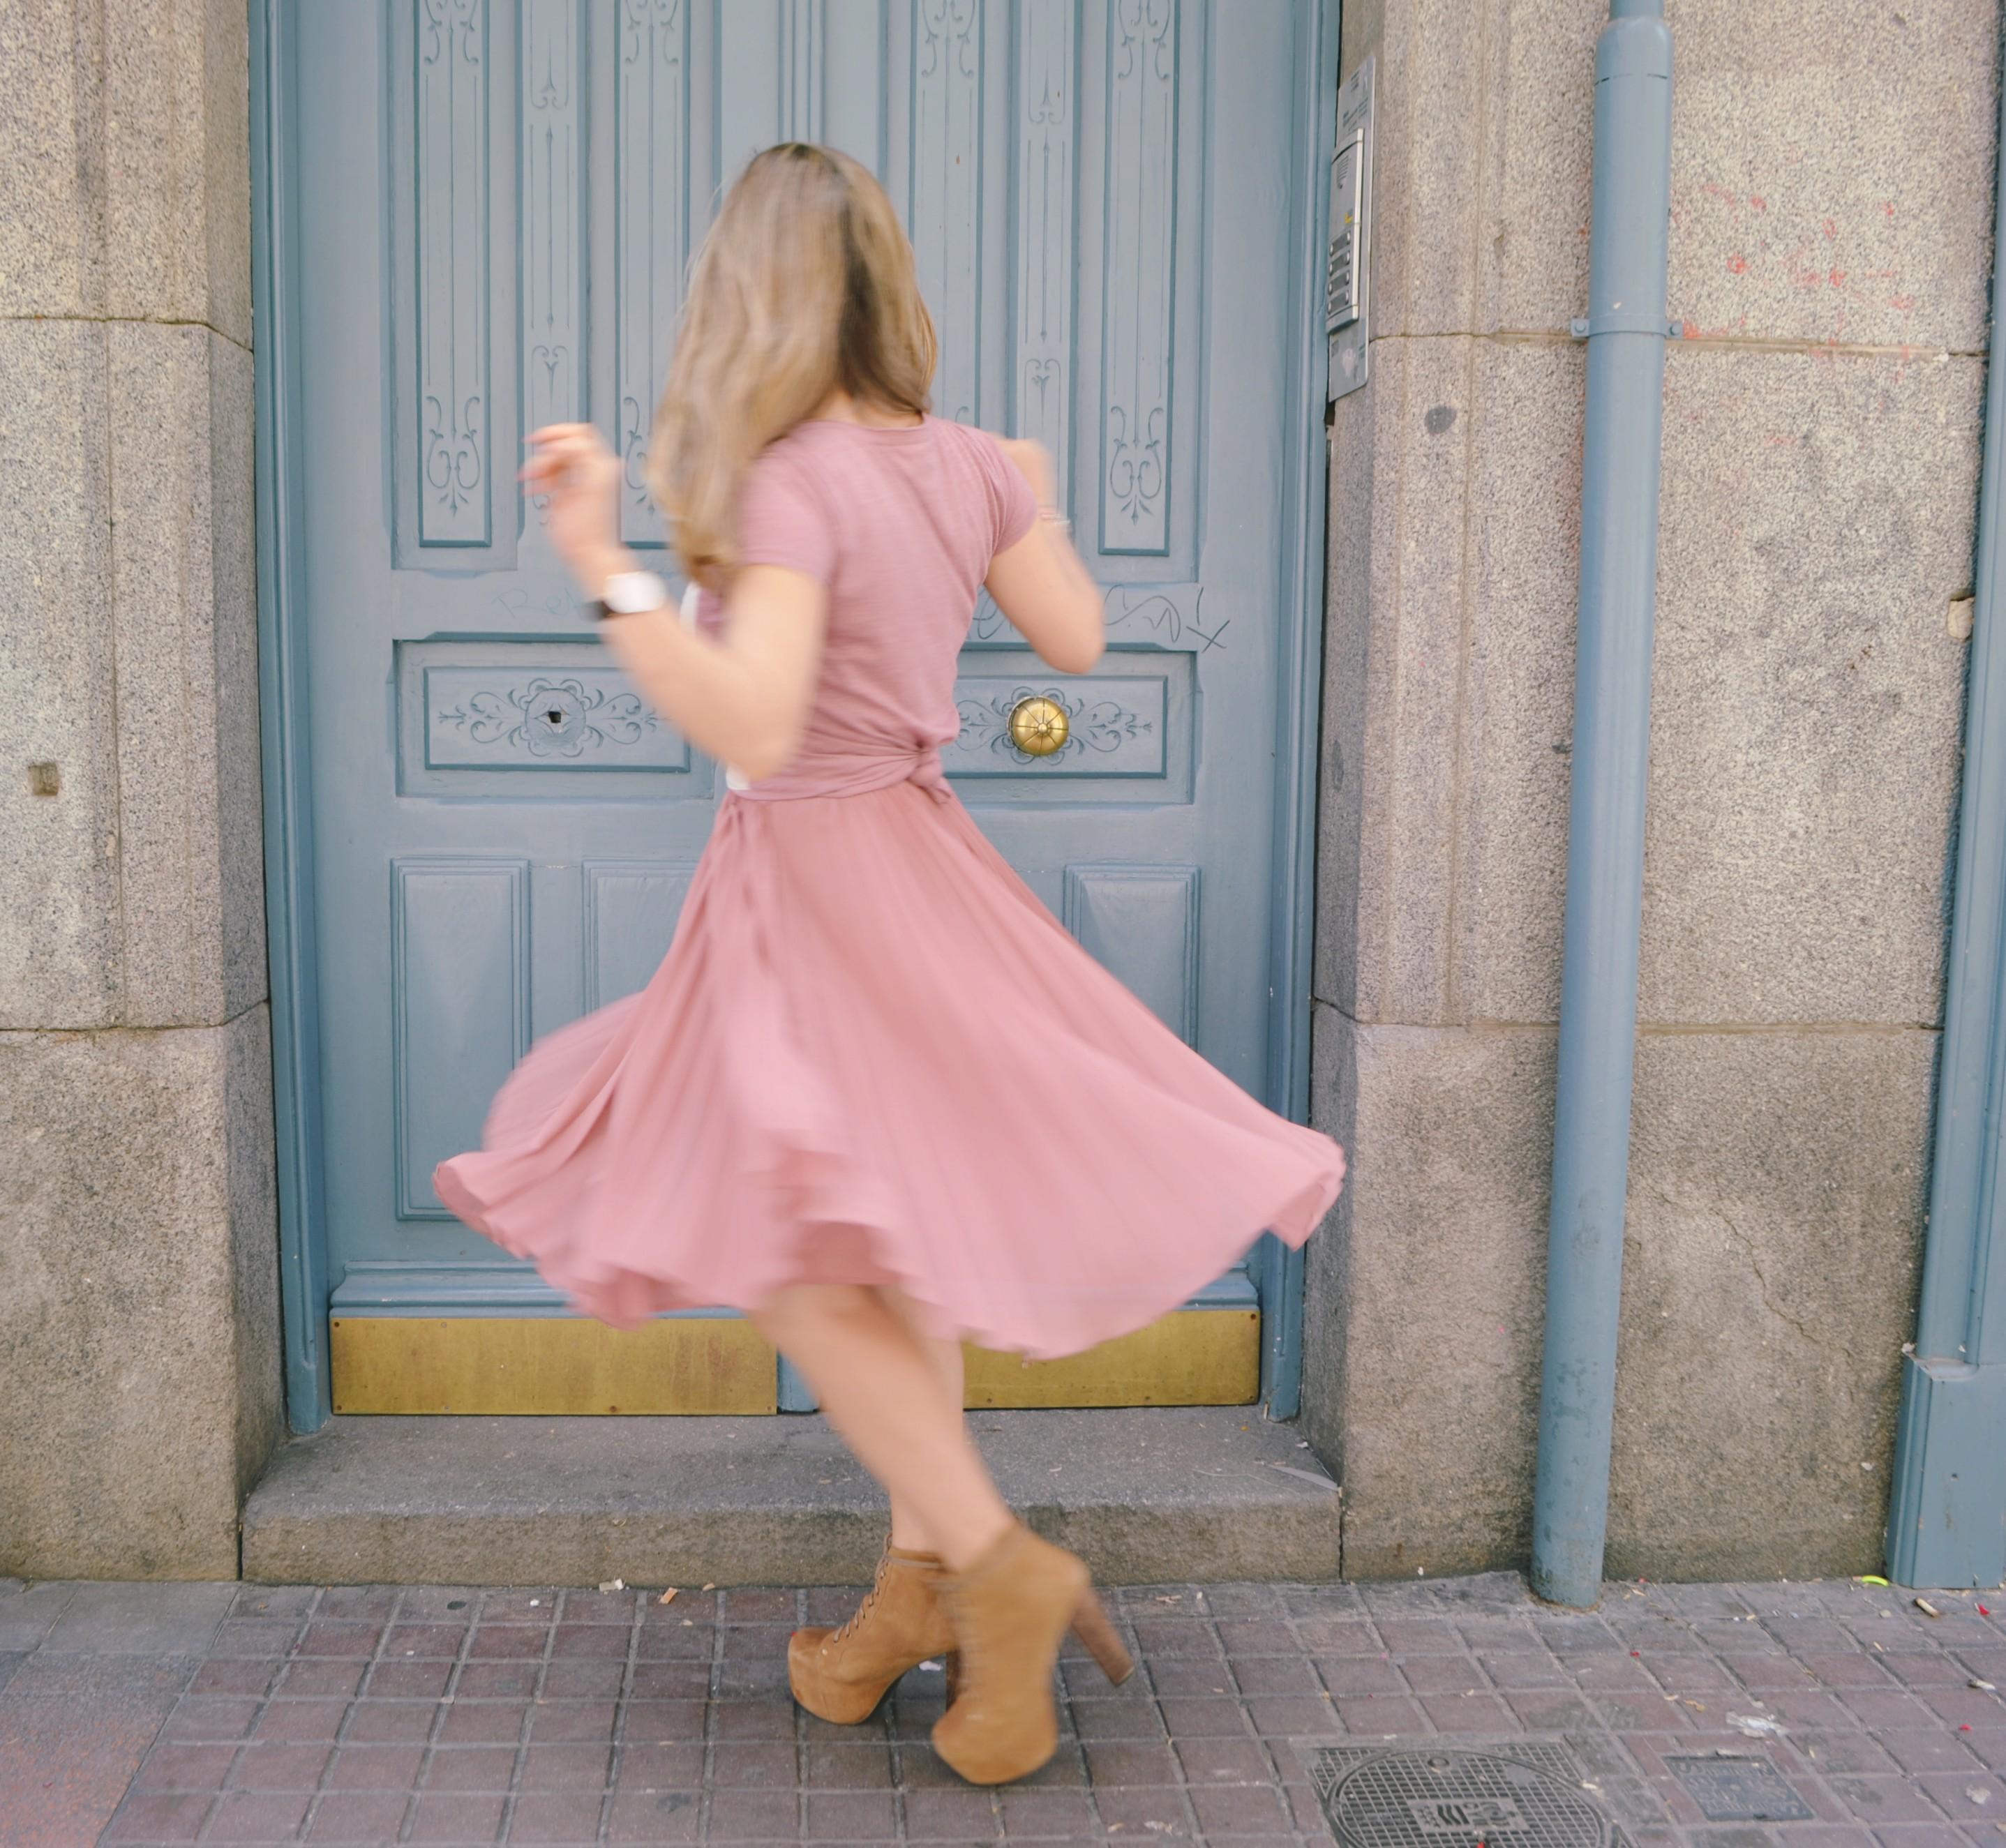 Madrid-street-style-look-Rose-Quartz-fashionista-Bolsos-de-verano-Pepe-Moll-ChicAdicta-Chic-Adicta-Daniel-Wellington-watch-PiensaenChic-Piensa-en-Chic